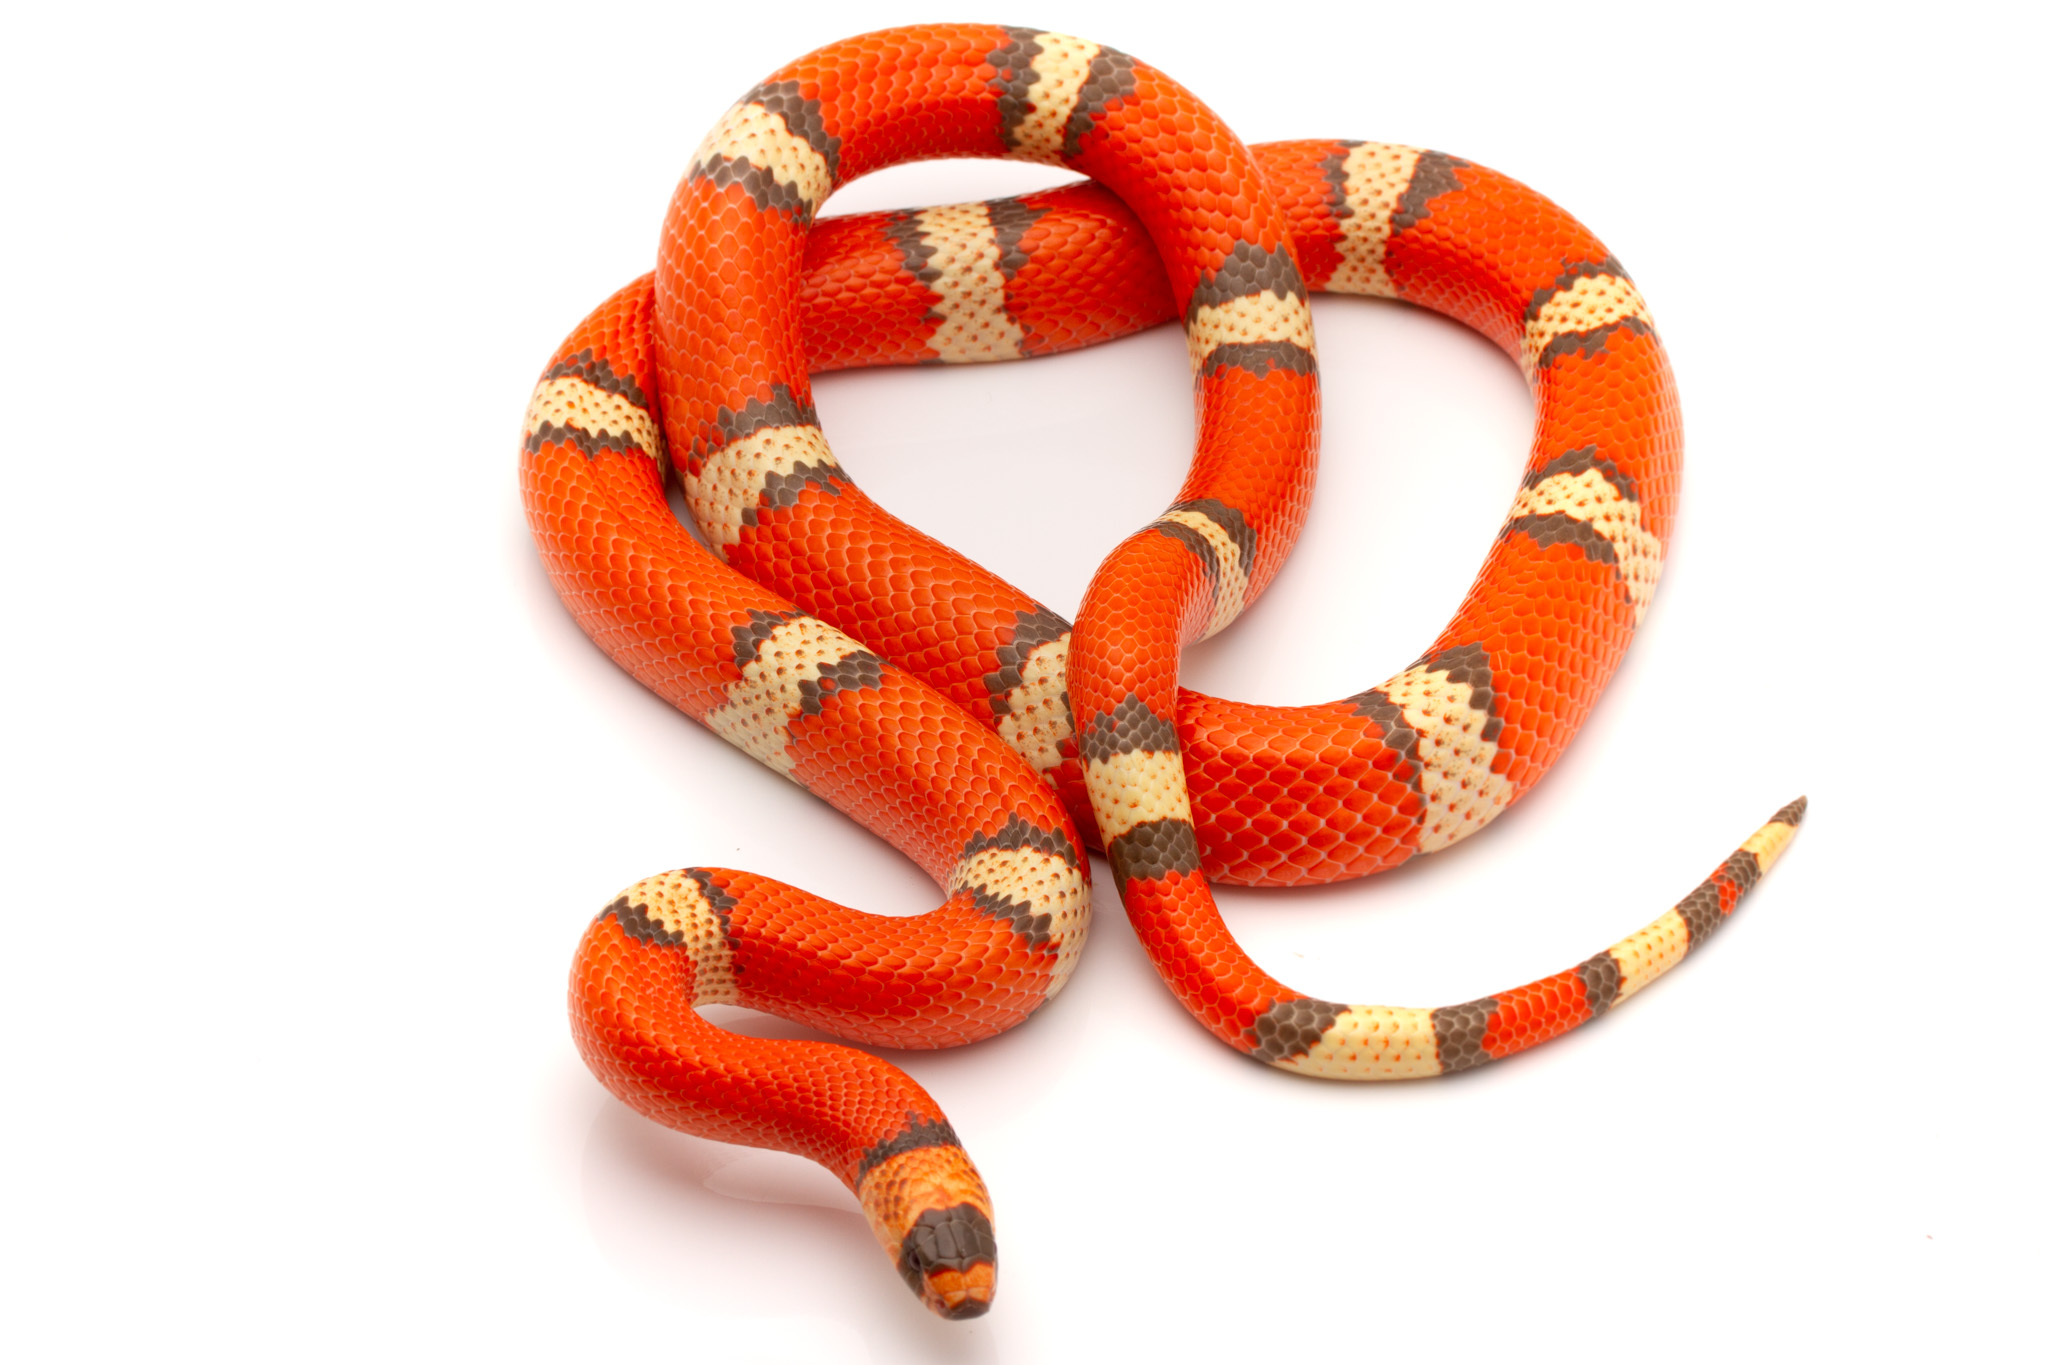 Honduran Milk Snake for sale